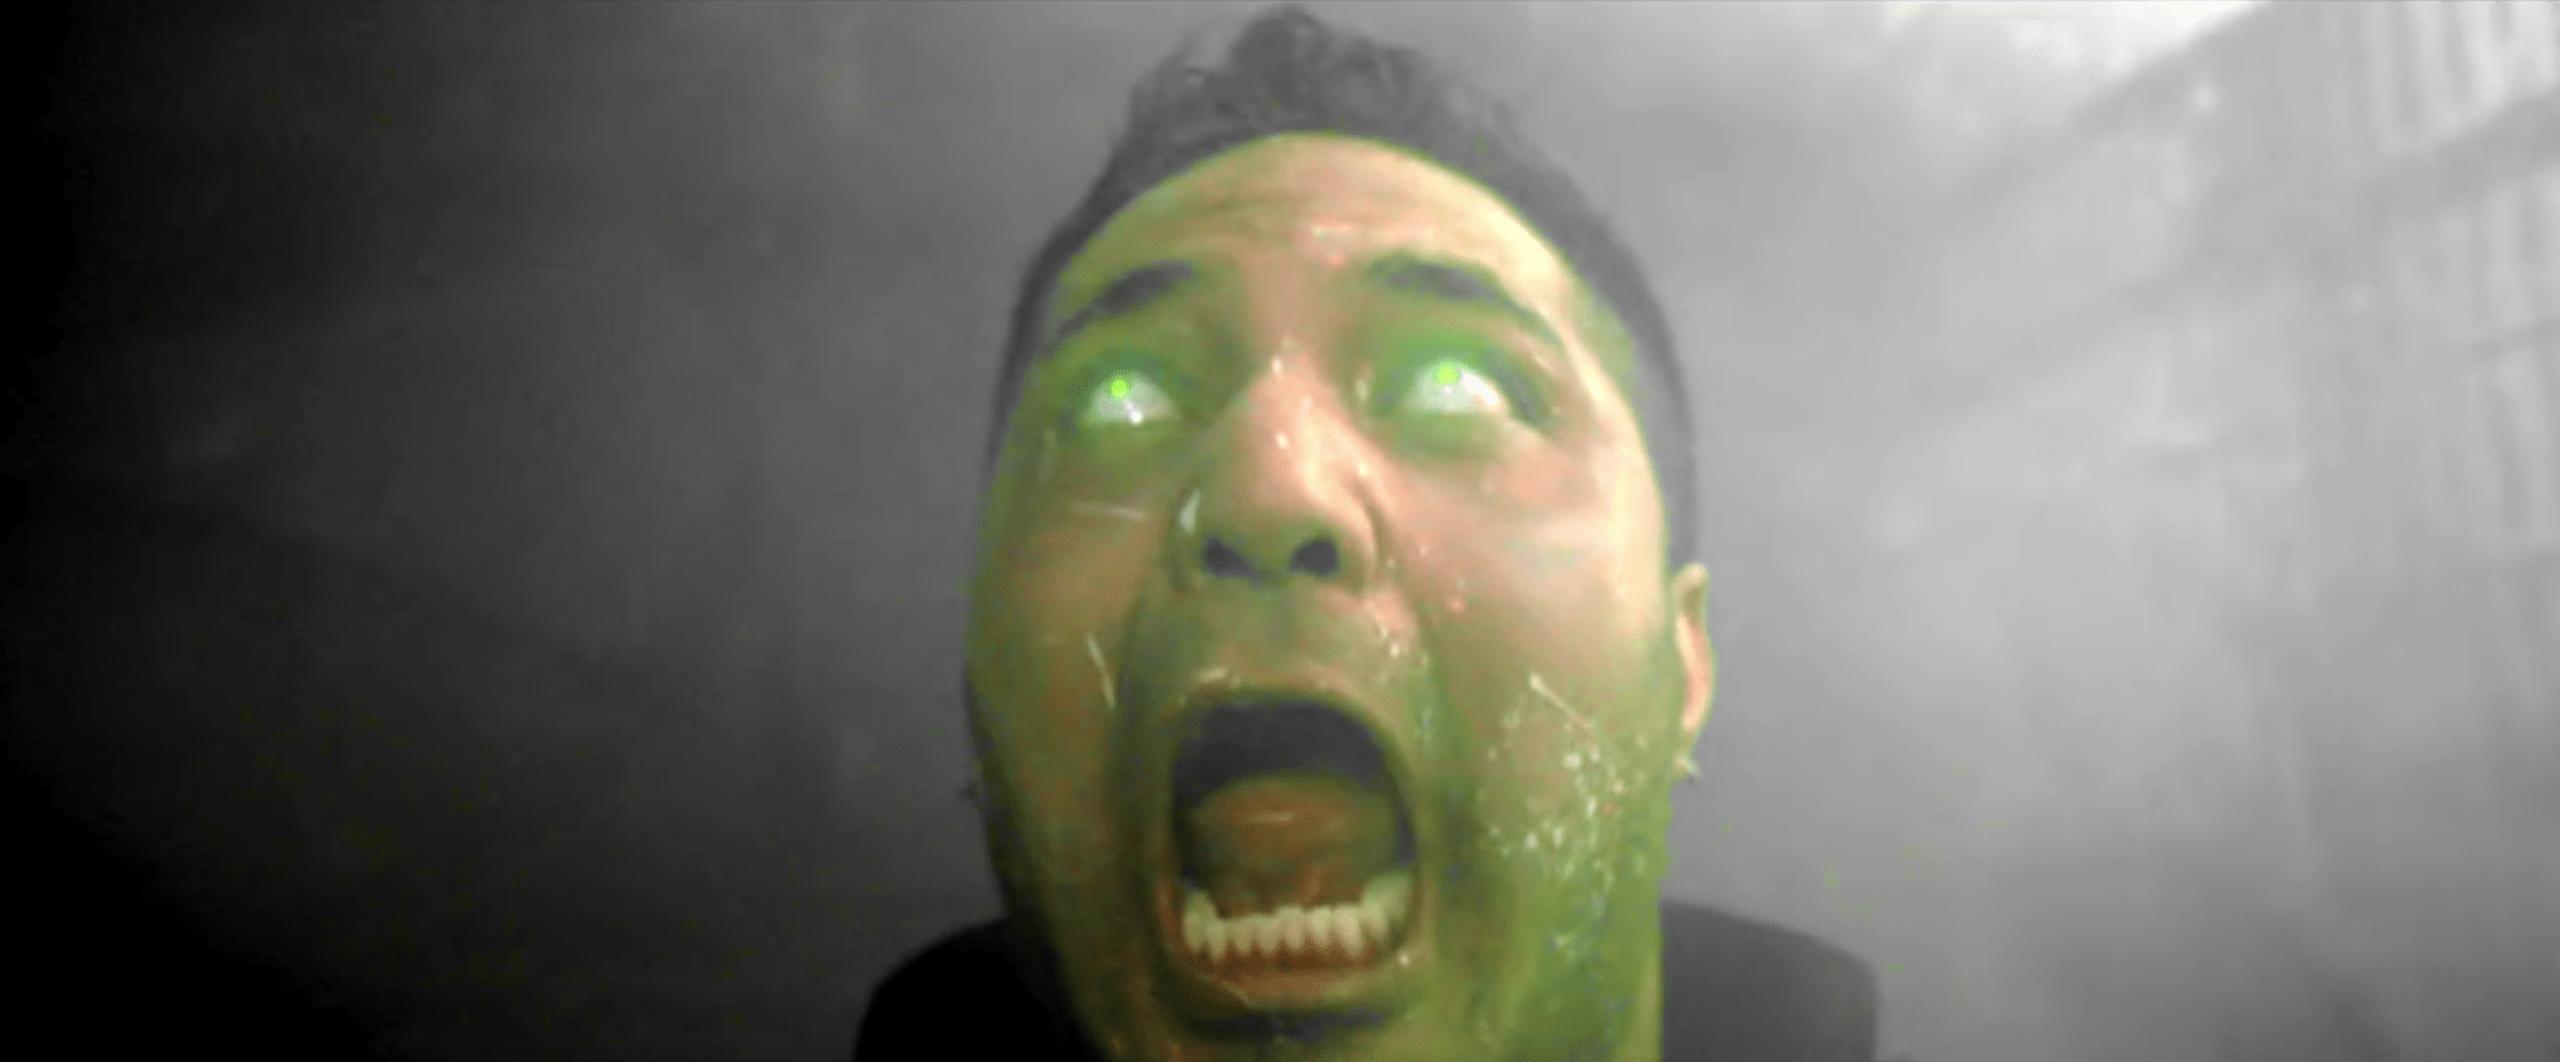 A screaming zombie commando